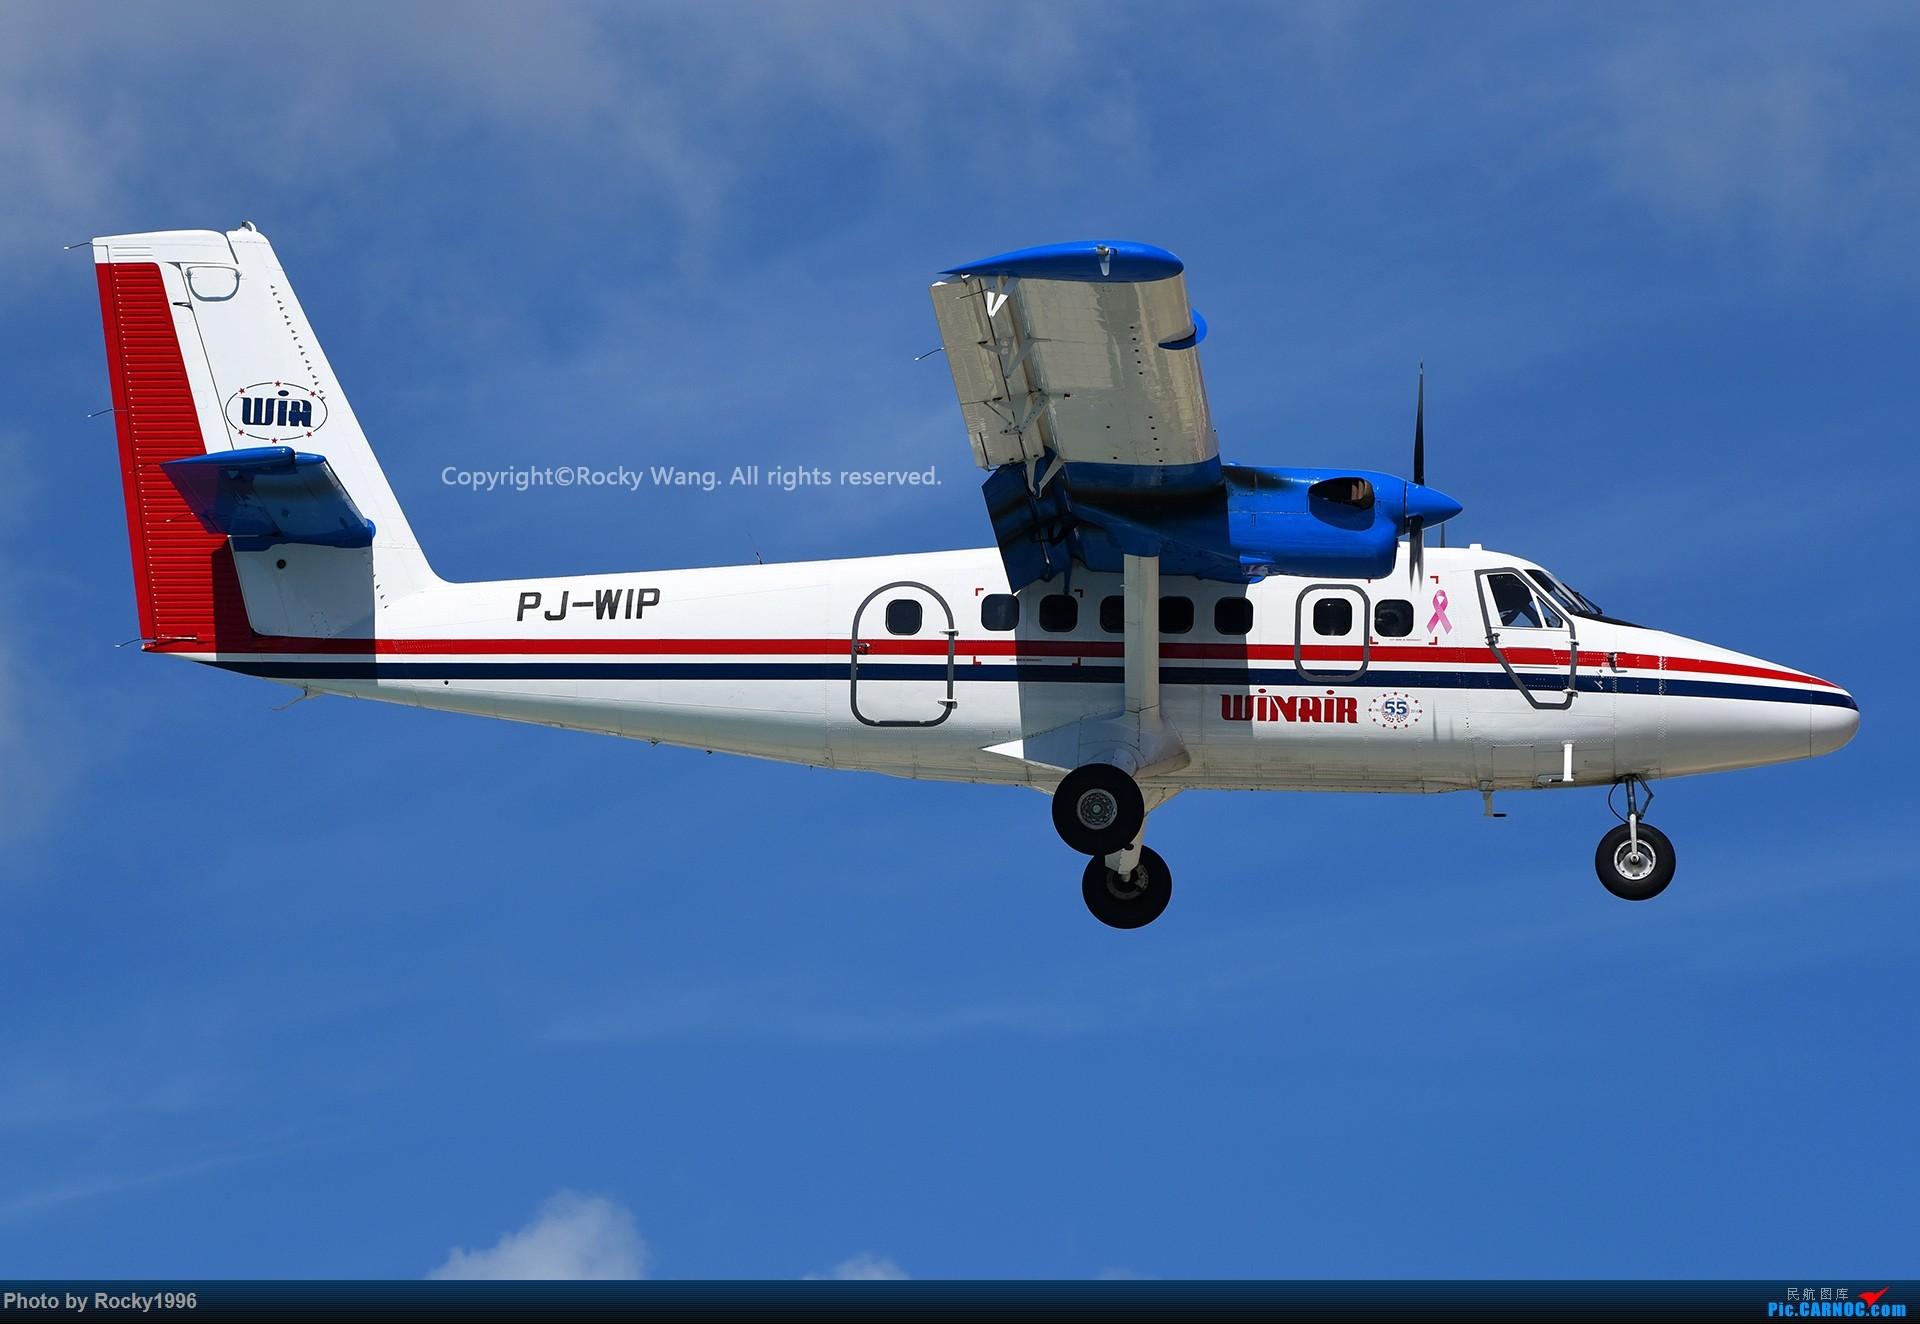 Re:[原创]My endless Caribbean dream——圣马丁朱莉安娜公主机场拍机记 DE HAVILLAND CANADA DHC-6-300 TWIN OTTER PJ-WIP 荷属安的列斯群岛朱利安娜公主机场